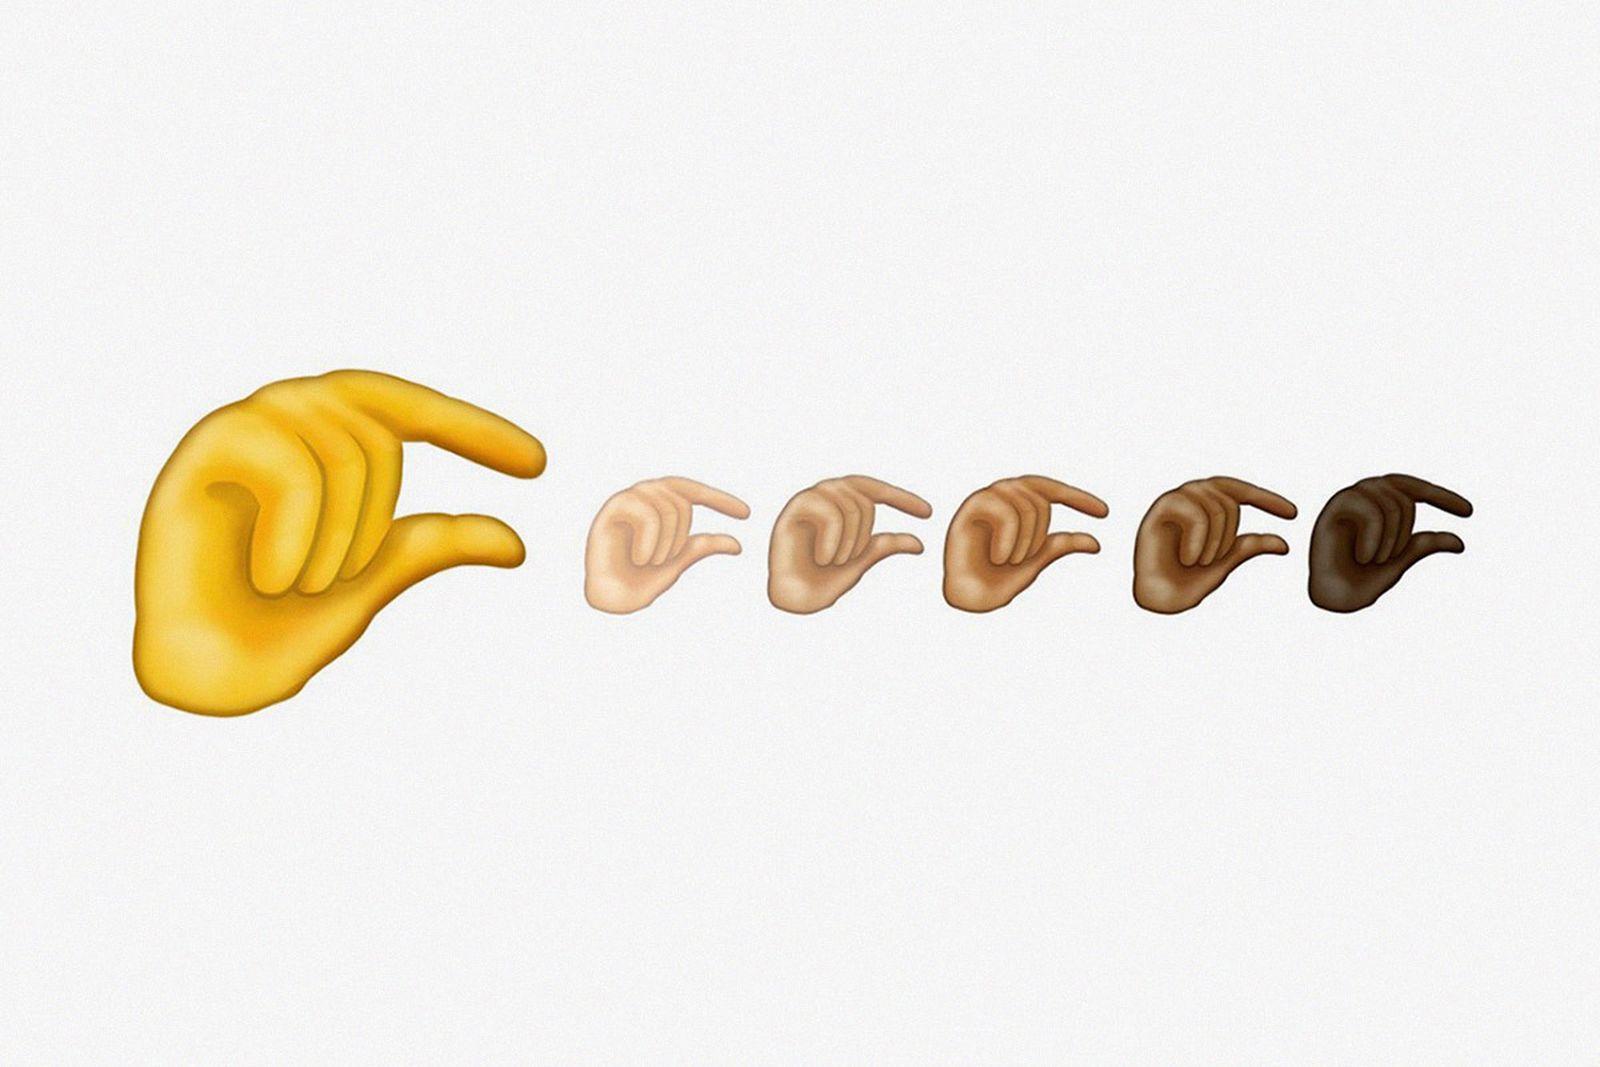 new emojis 2019